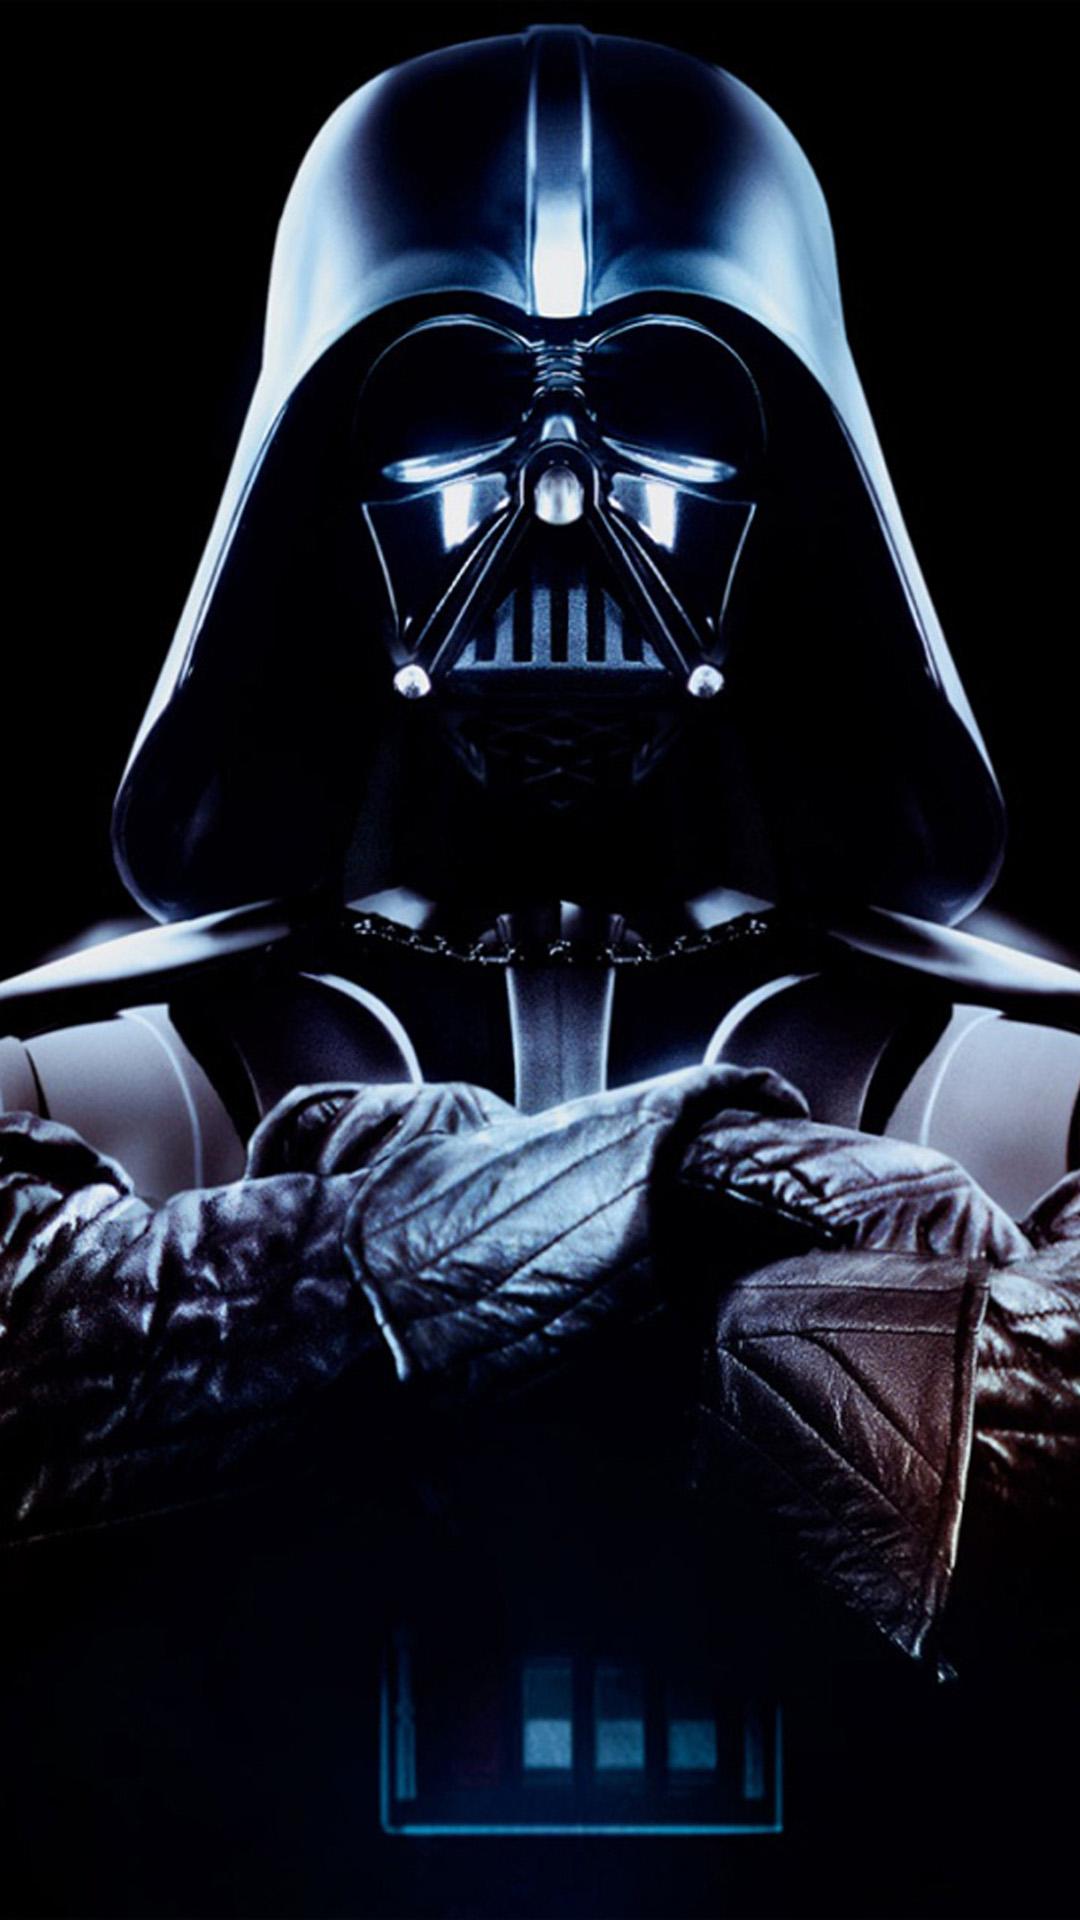 Free Download Funny Darth Vader Star Wars Hd Wallpaper Iphone 6